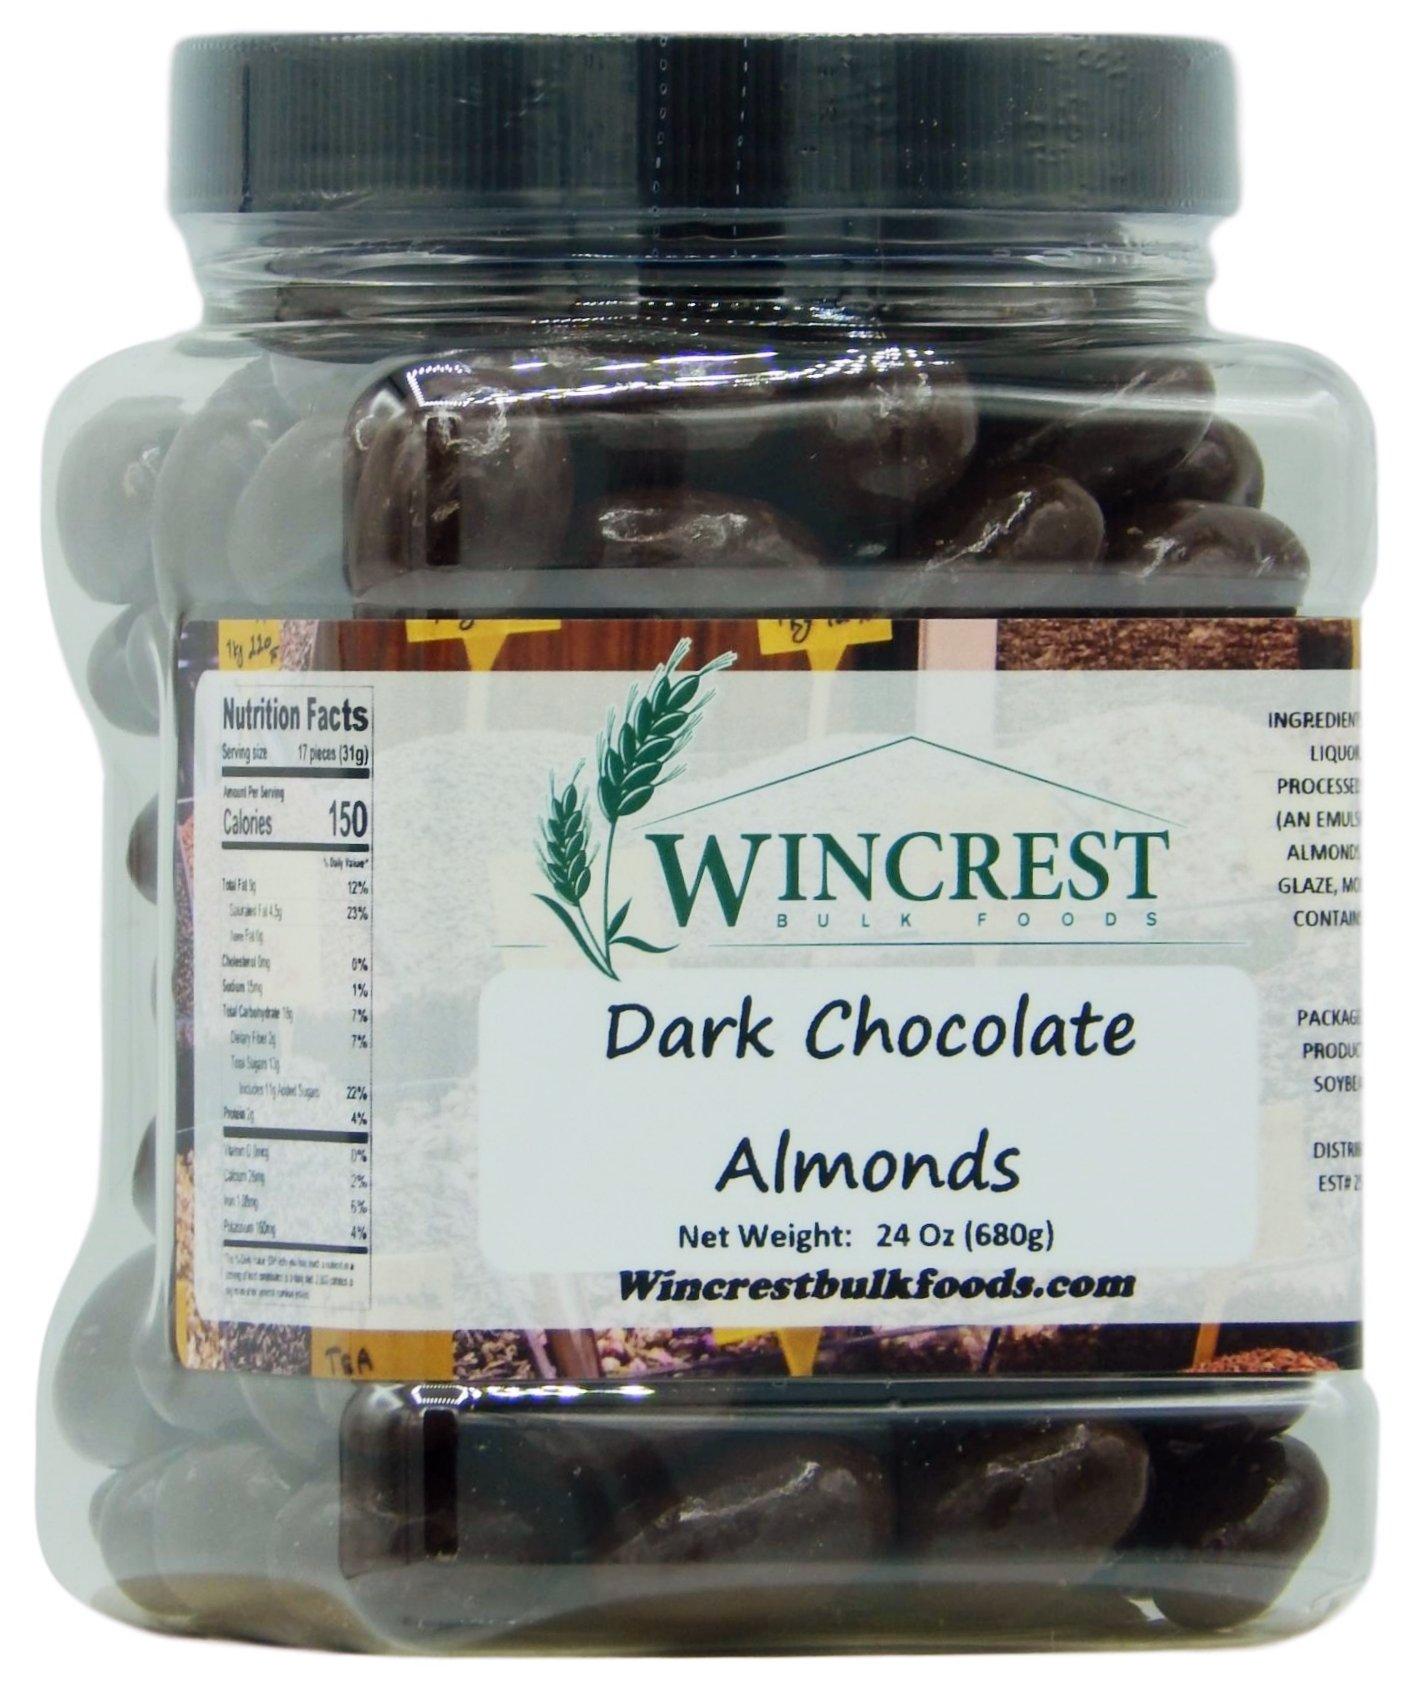 Dark Chocolate Almonds - 1.5 Lb Container